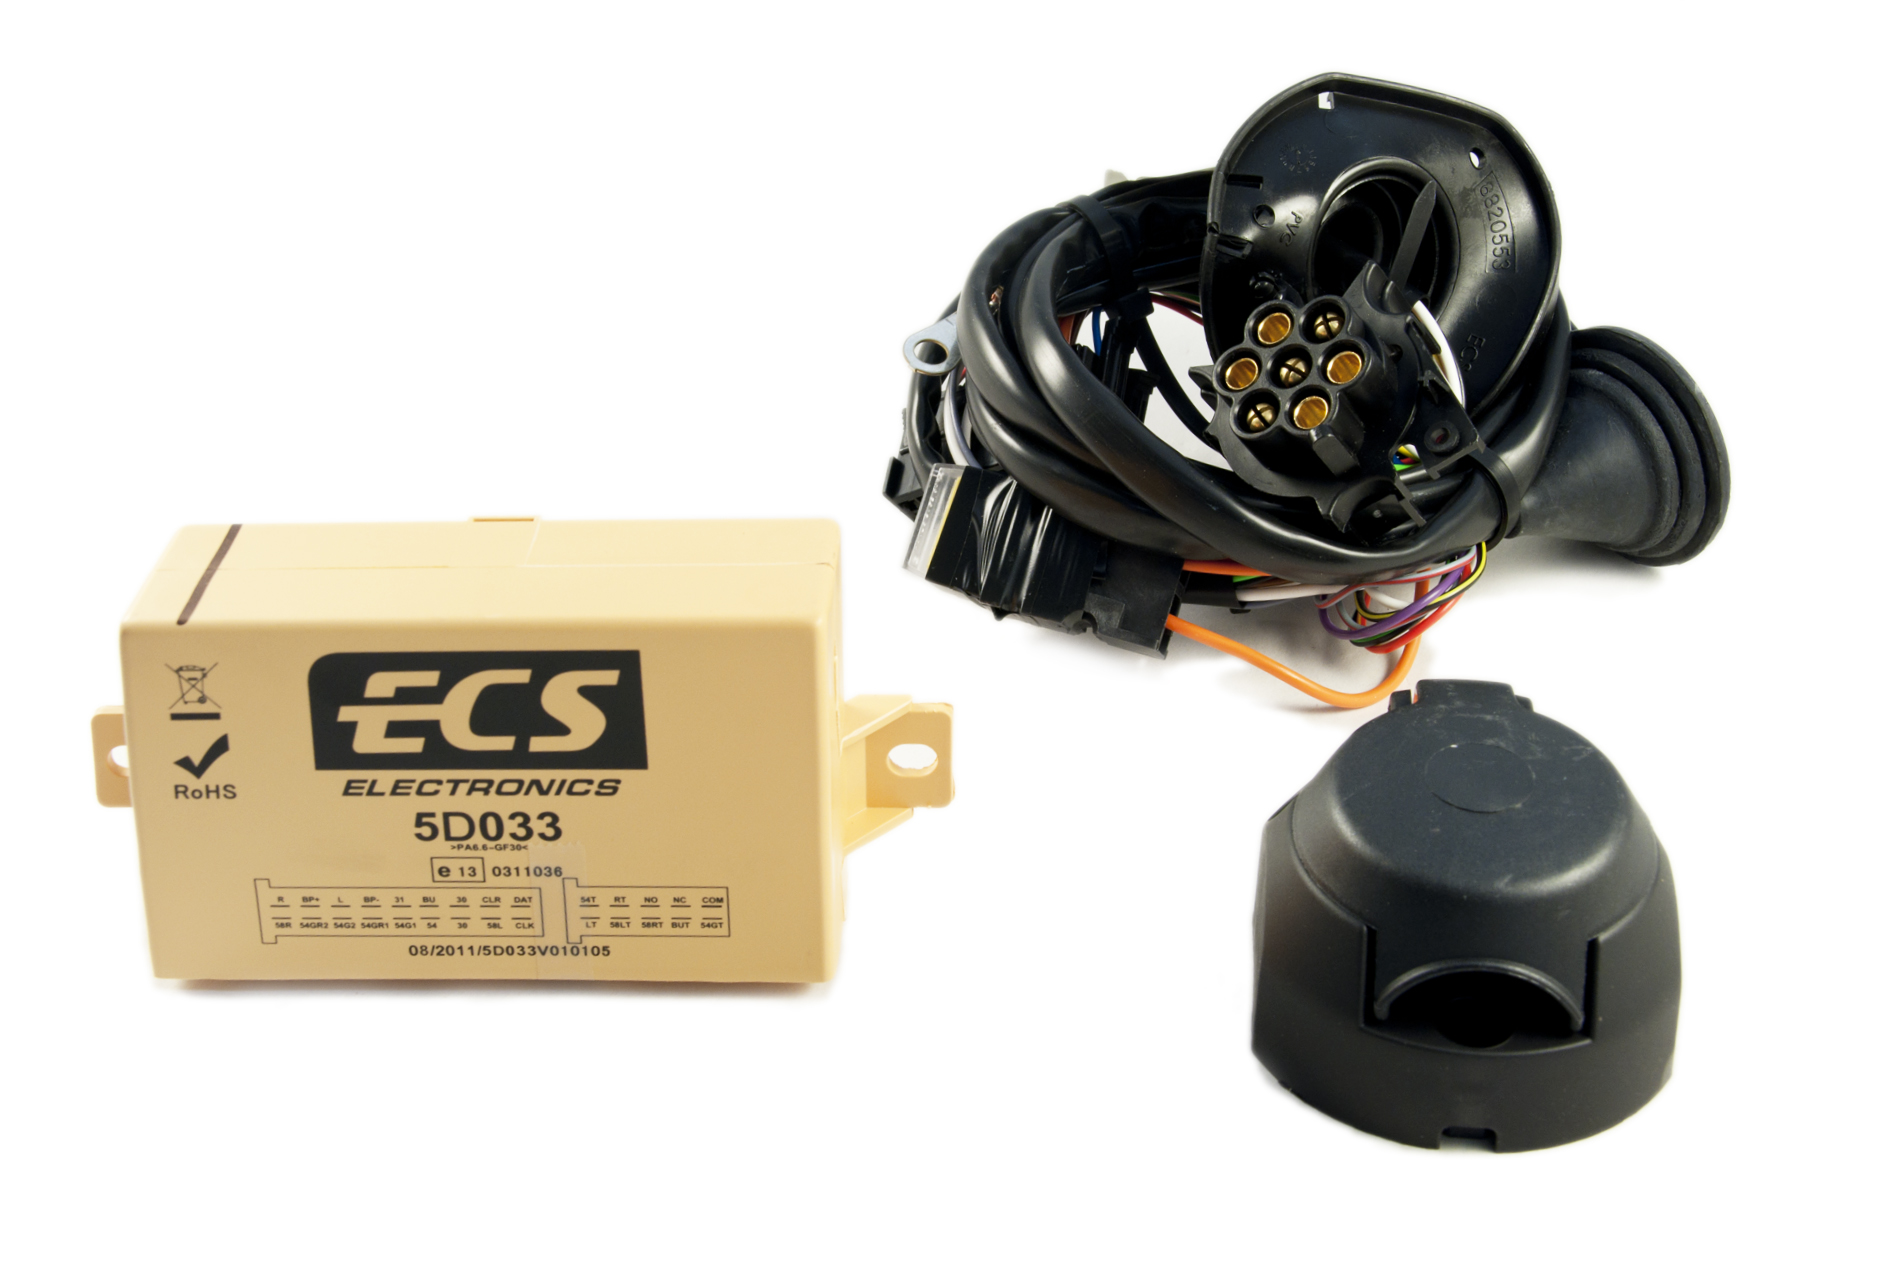 Pin Electrical Kit Wiring For Tow Bar Towbar Hitch Ke505jd113 Ebay